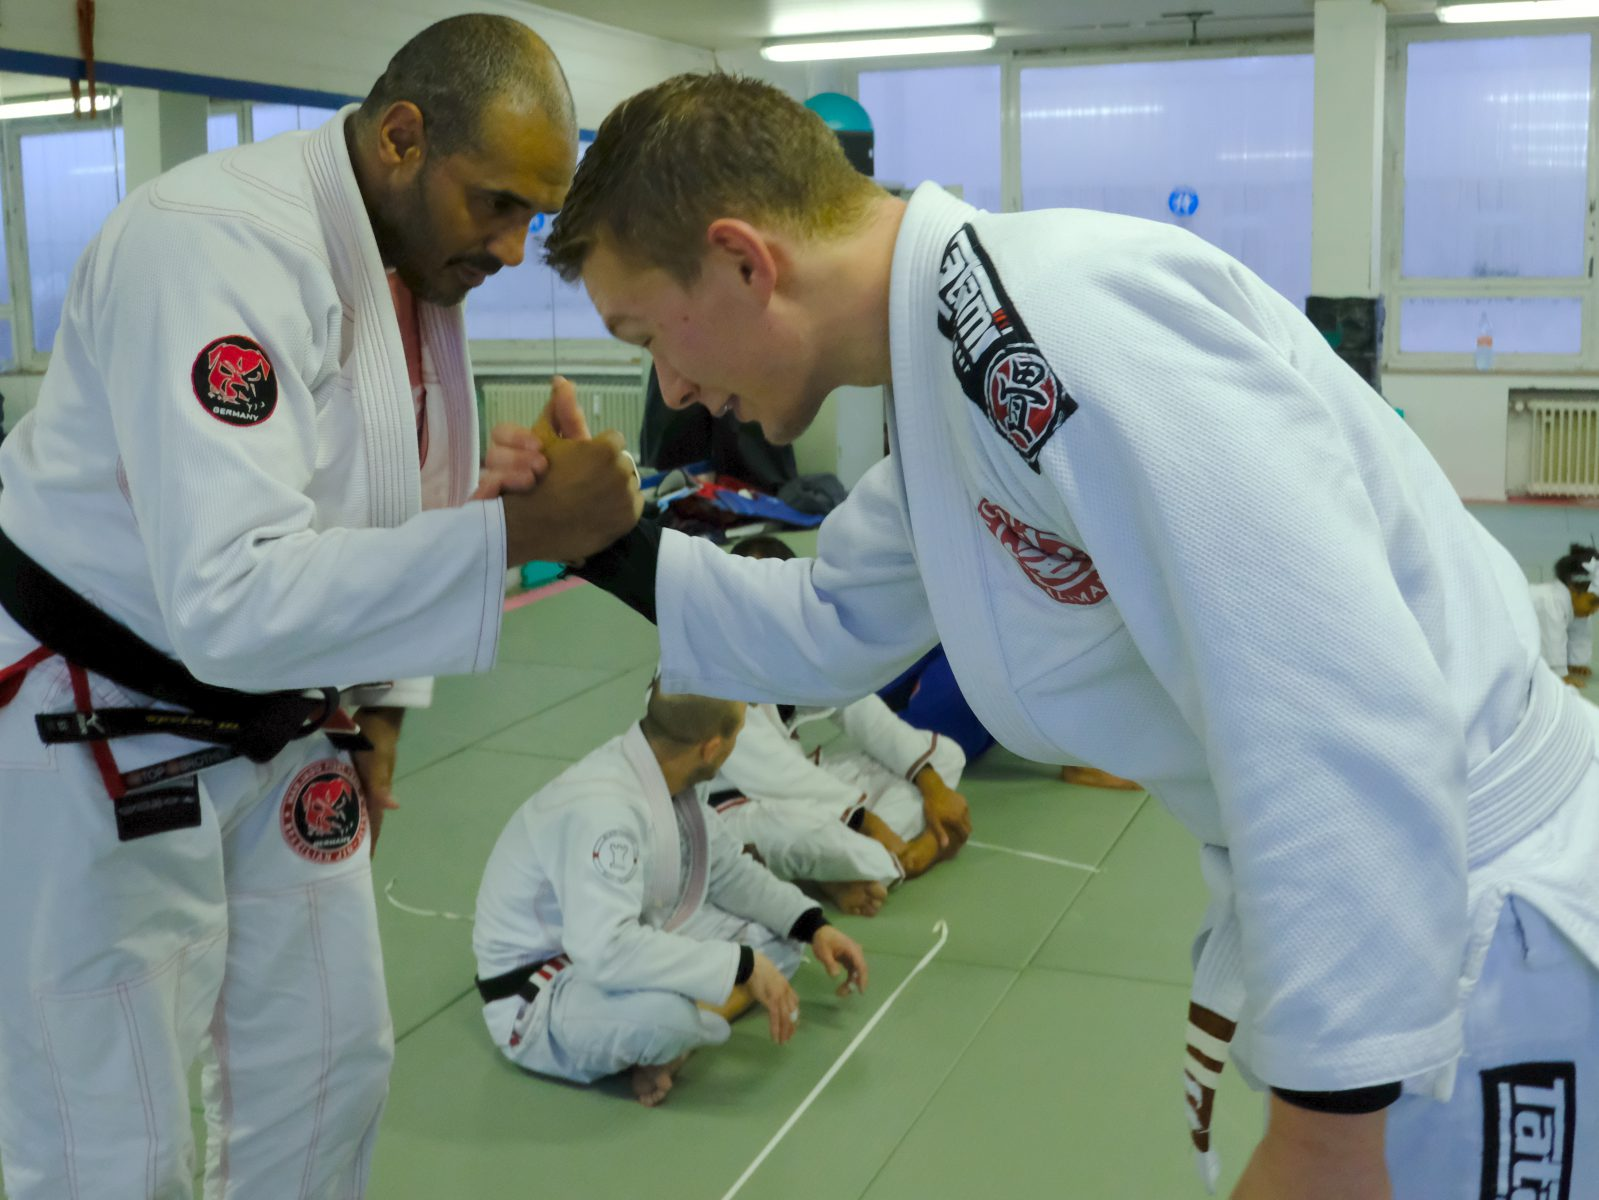 BJJ, Essen, Grappling, Rollen, Brazilian Jiu Jitsu, Ruhrgebiet, MMA